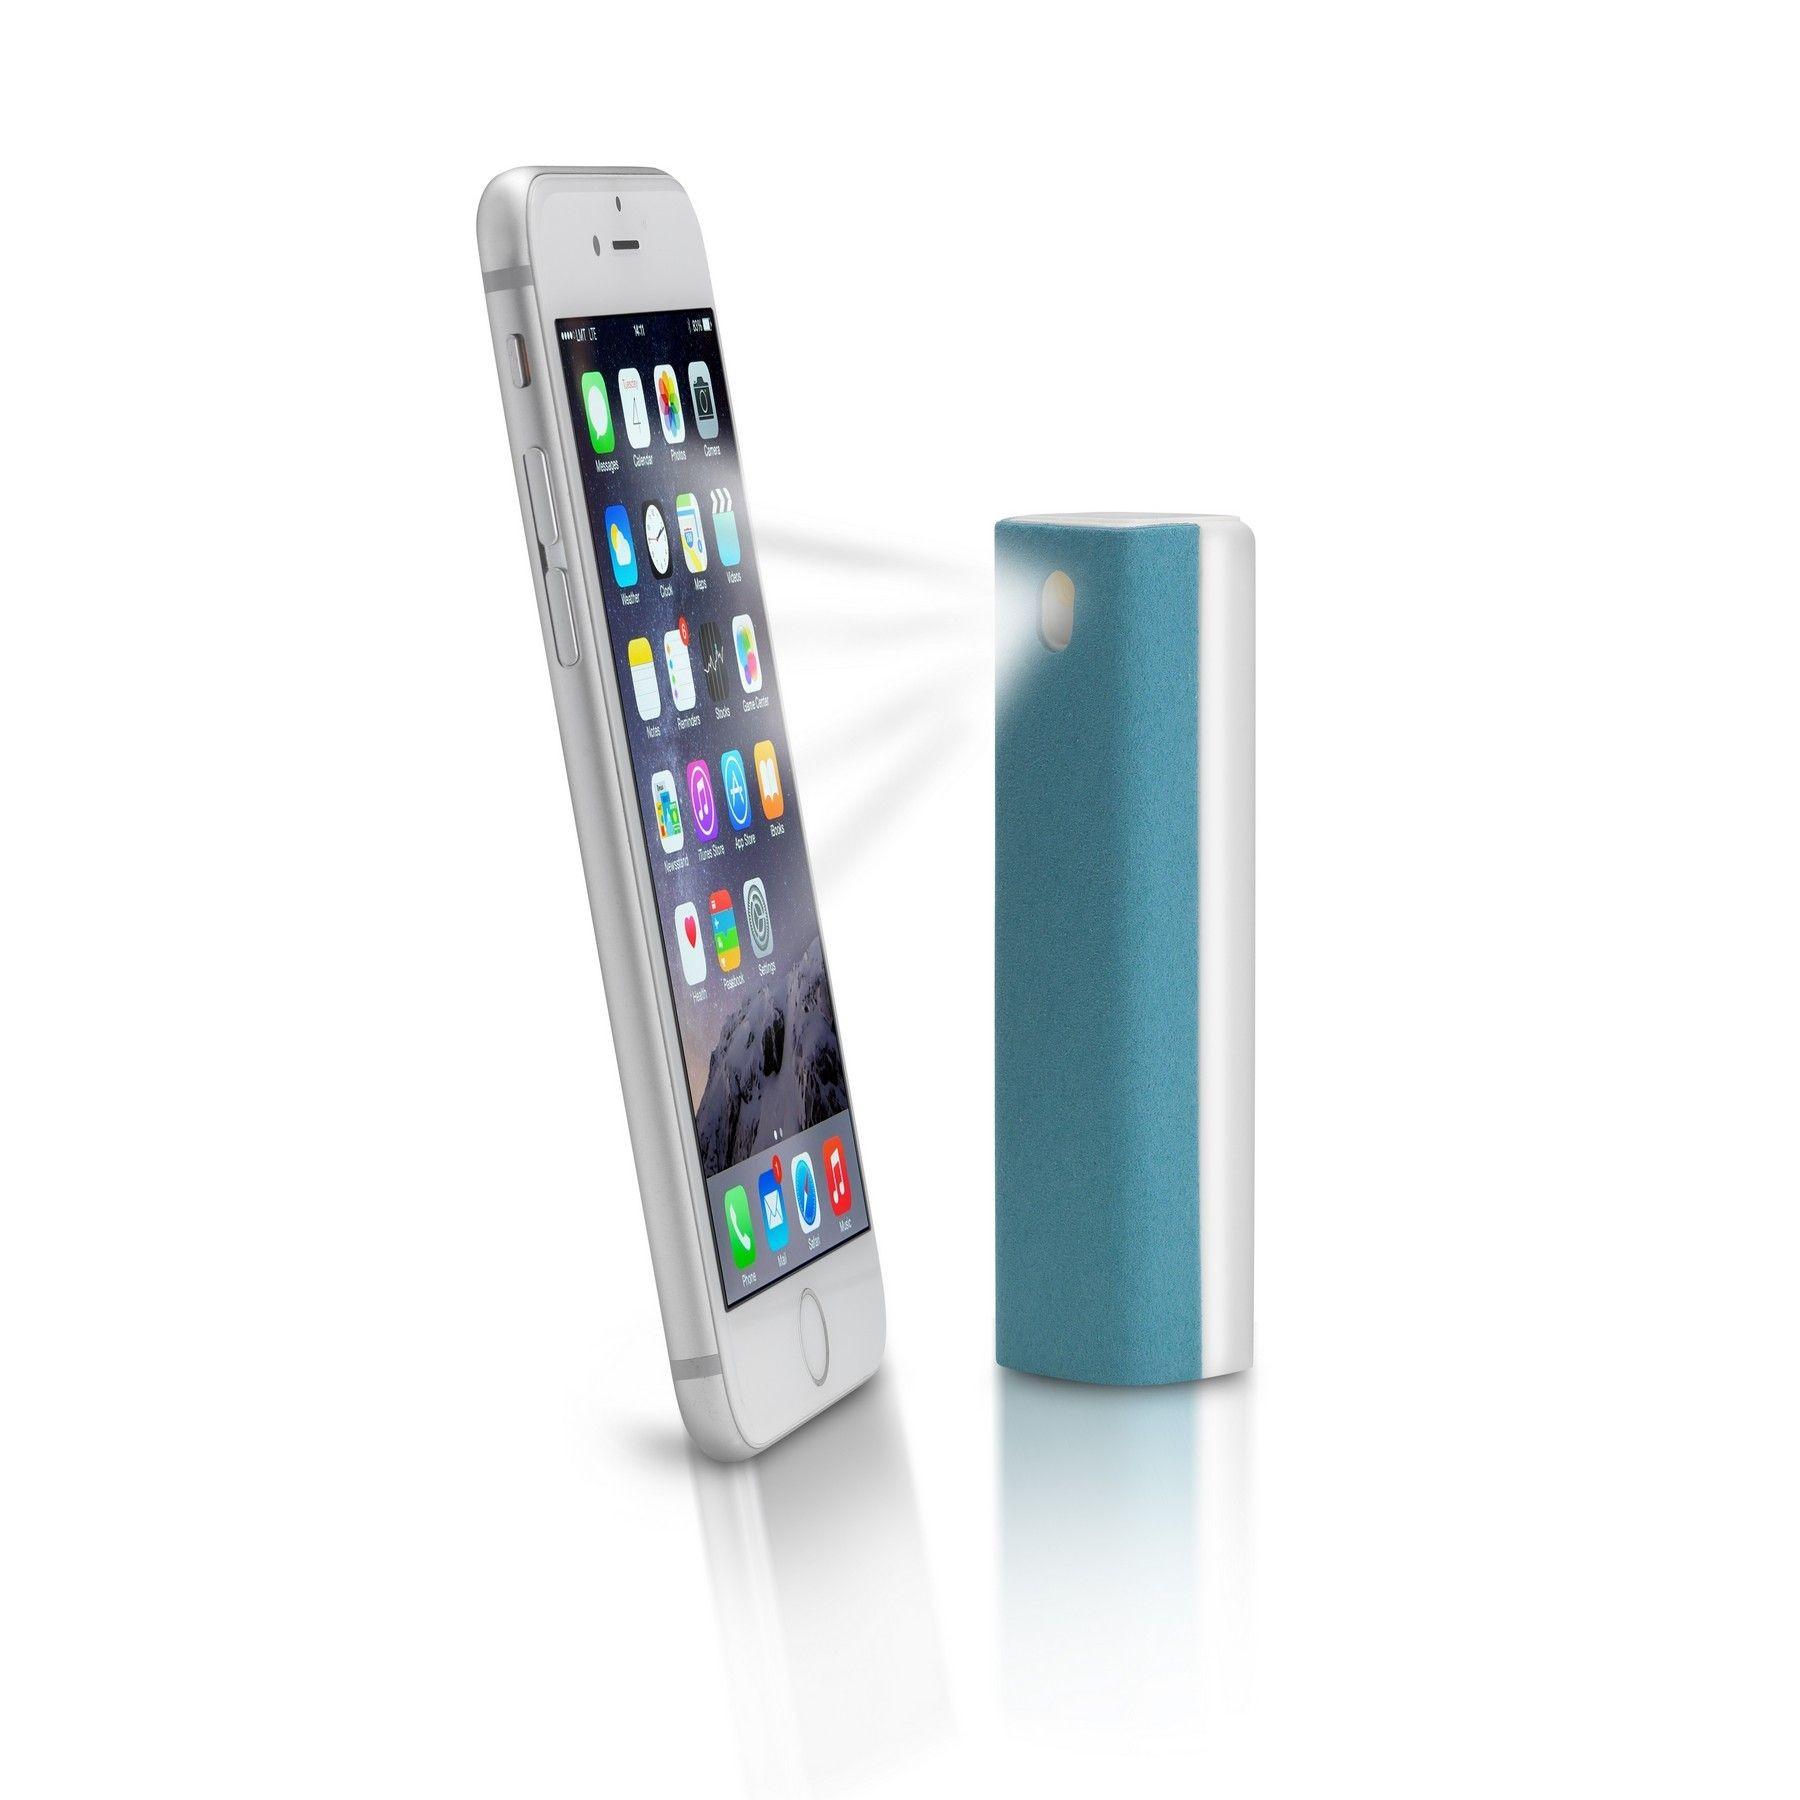 phone-sanitizer-phone-cleaner-spray-va-dc-ny